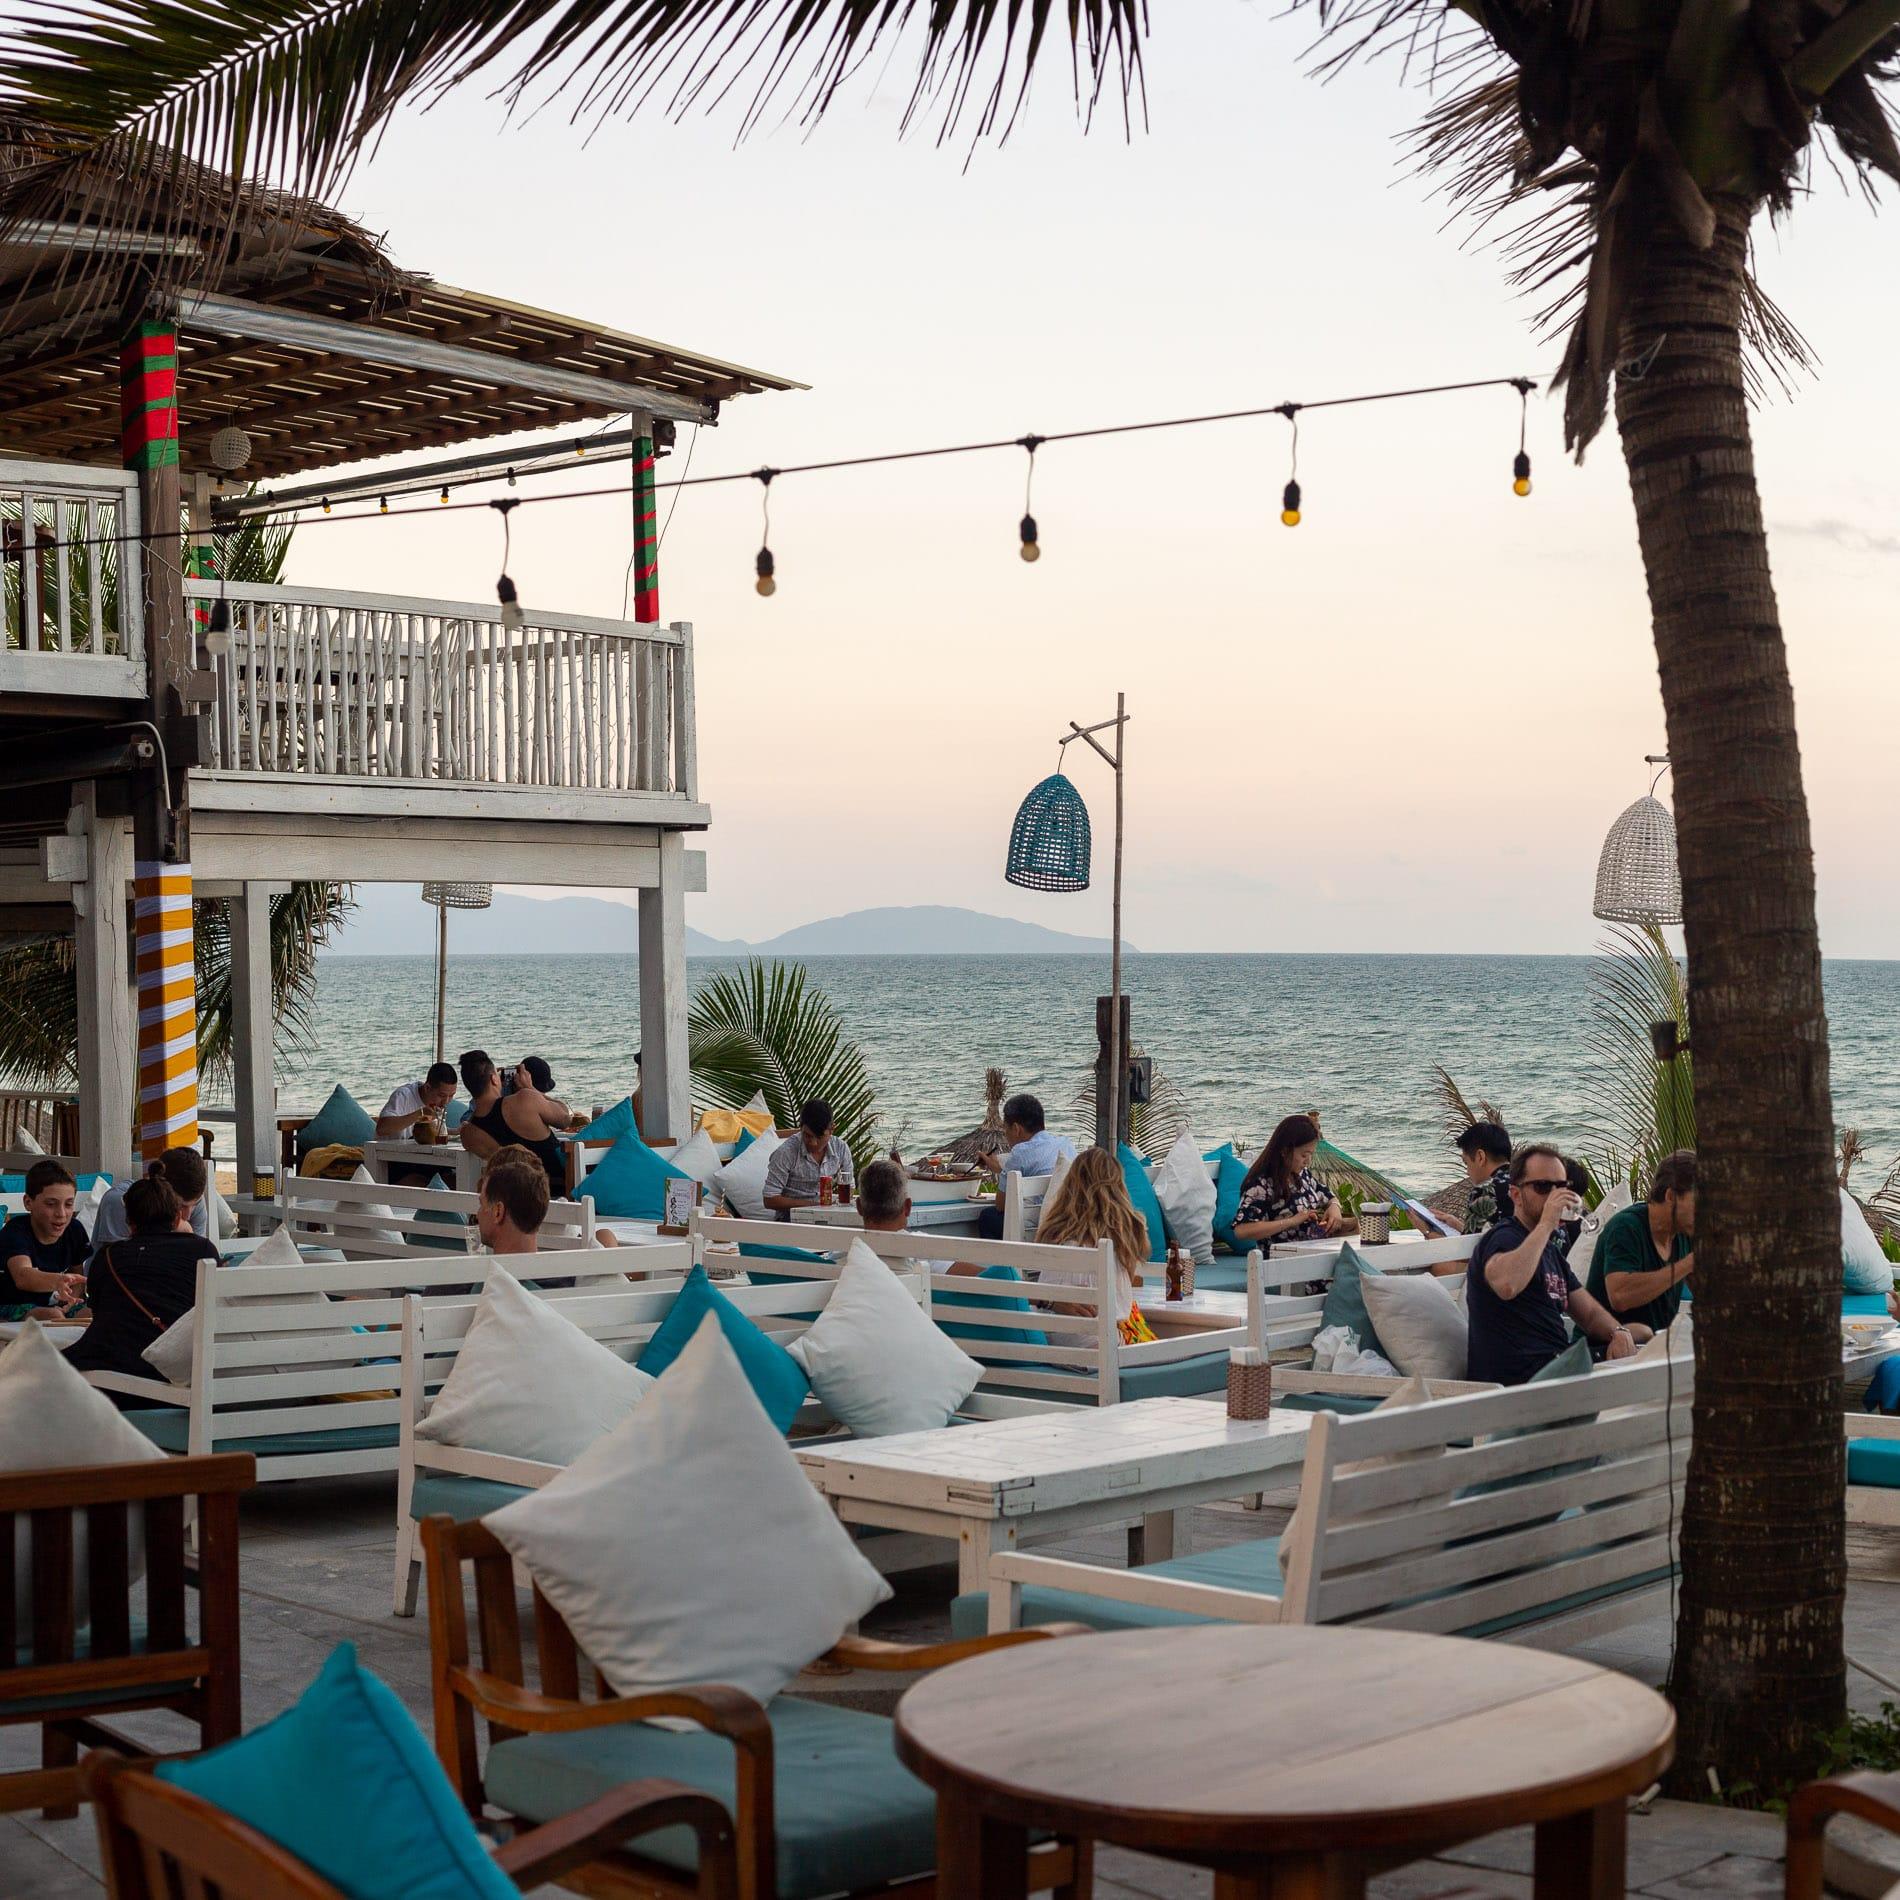 The best beachside burger in Hoi An at the Deckhouse Restaurant